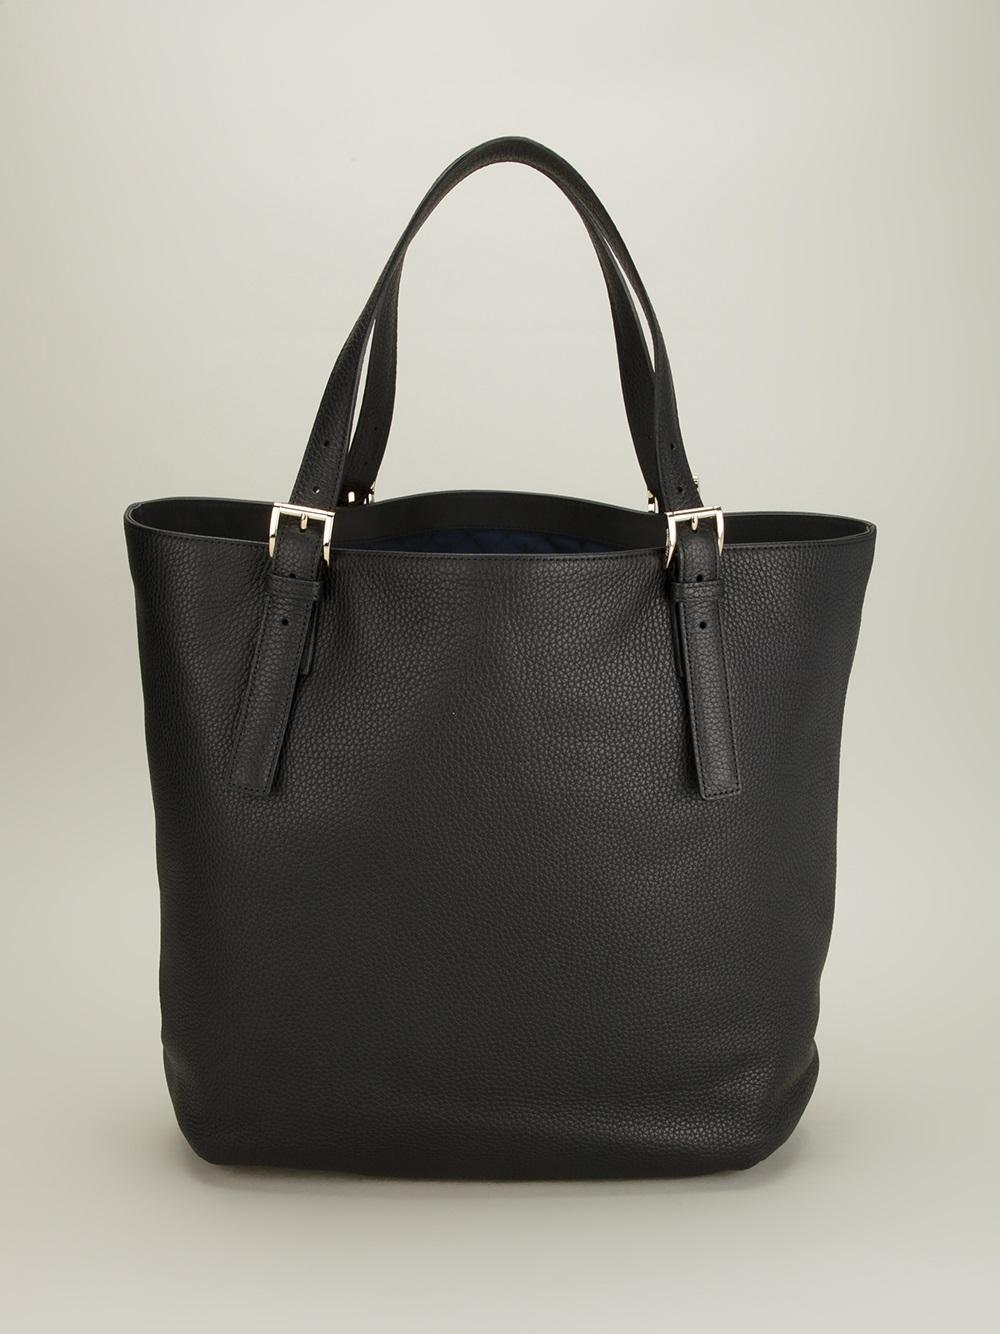 Trussardi Buckle Detail Tote Bag in Black